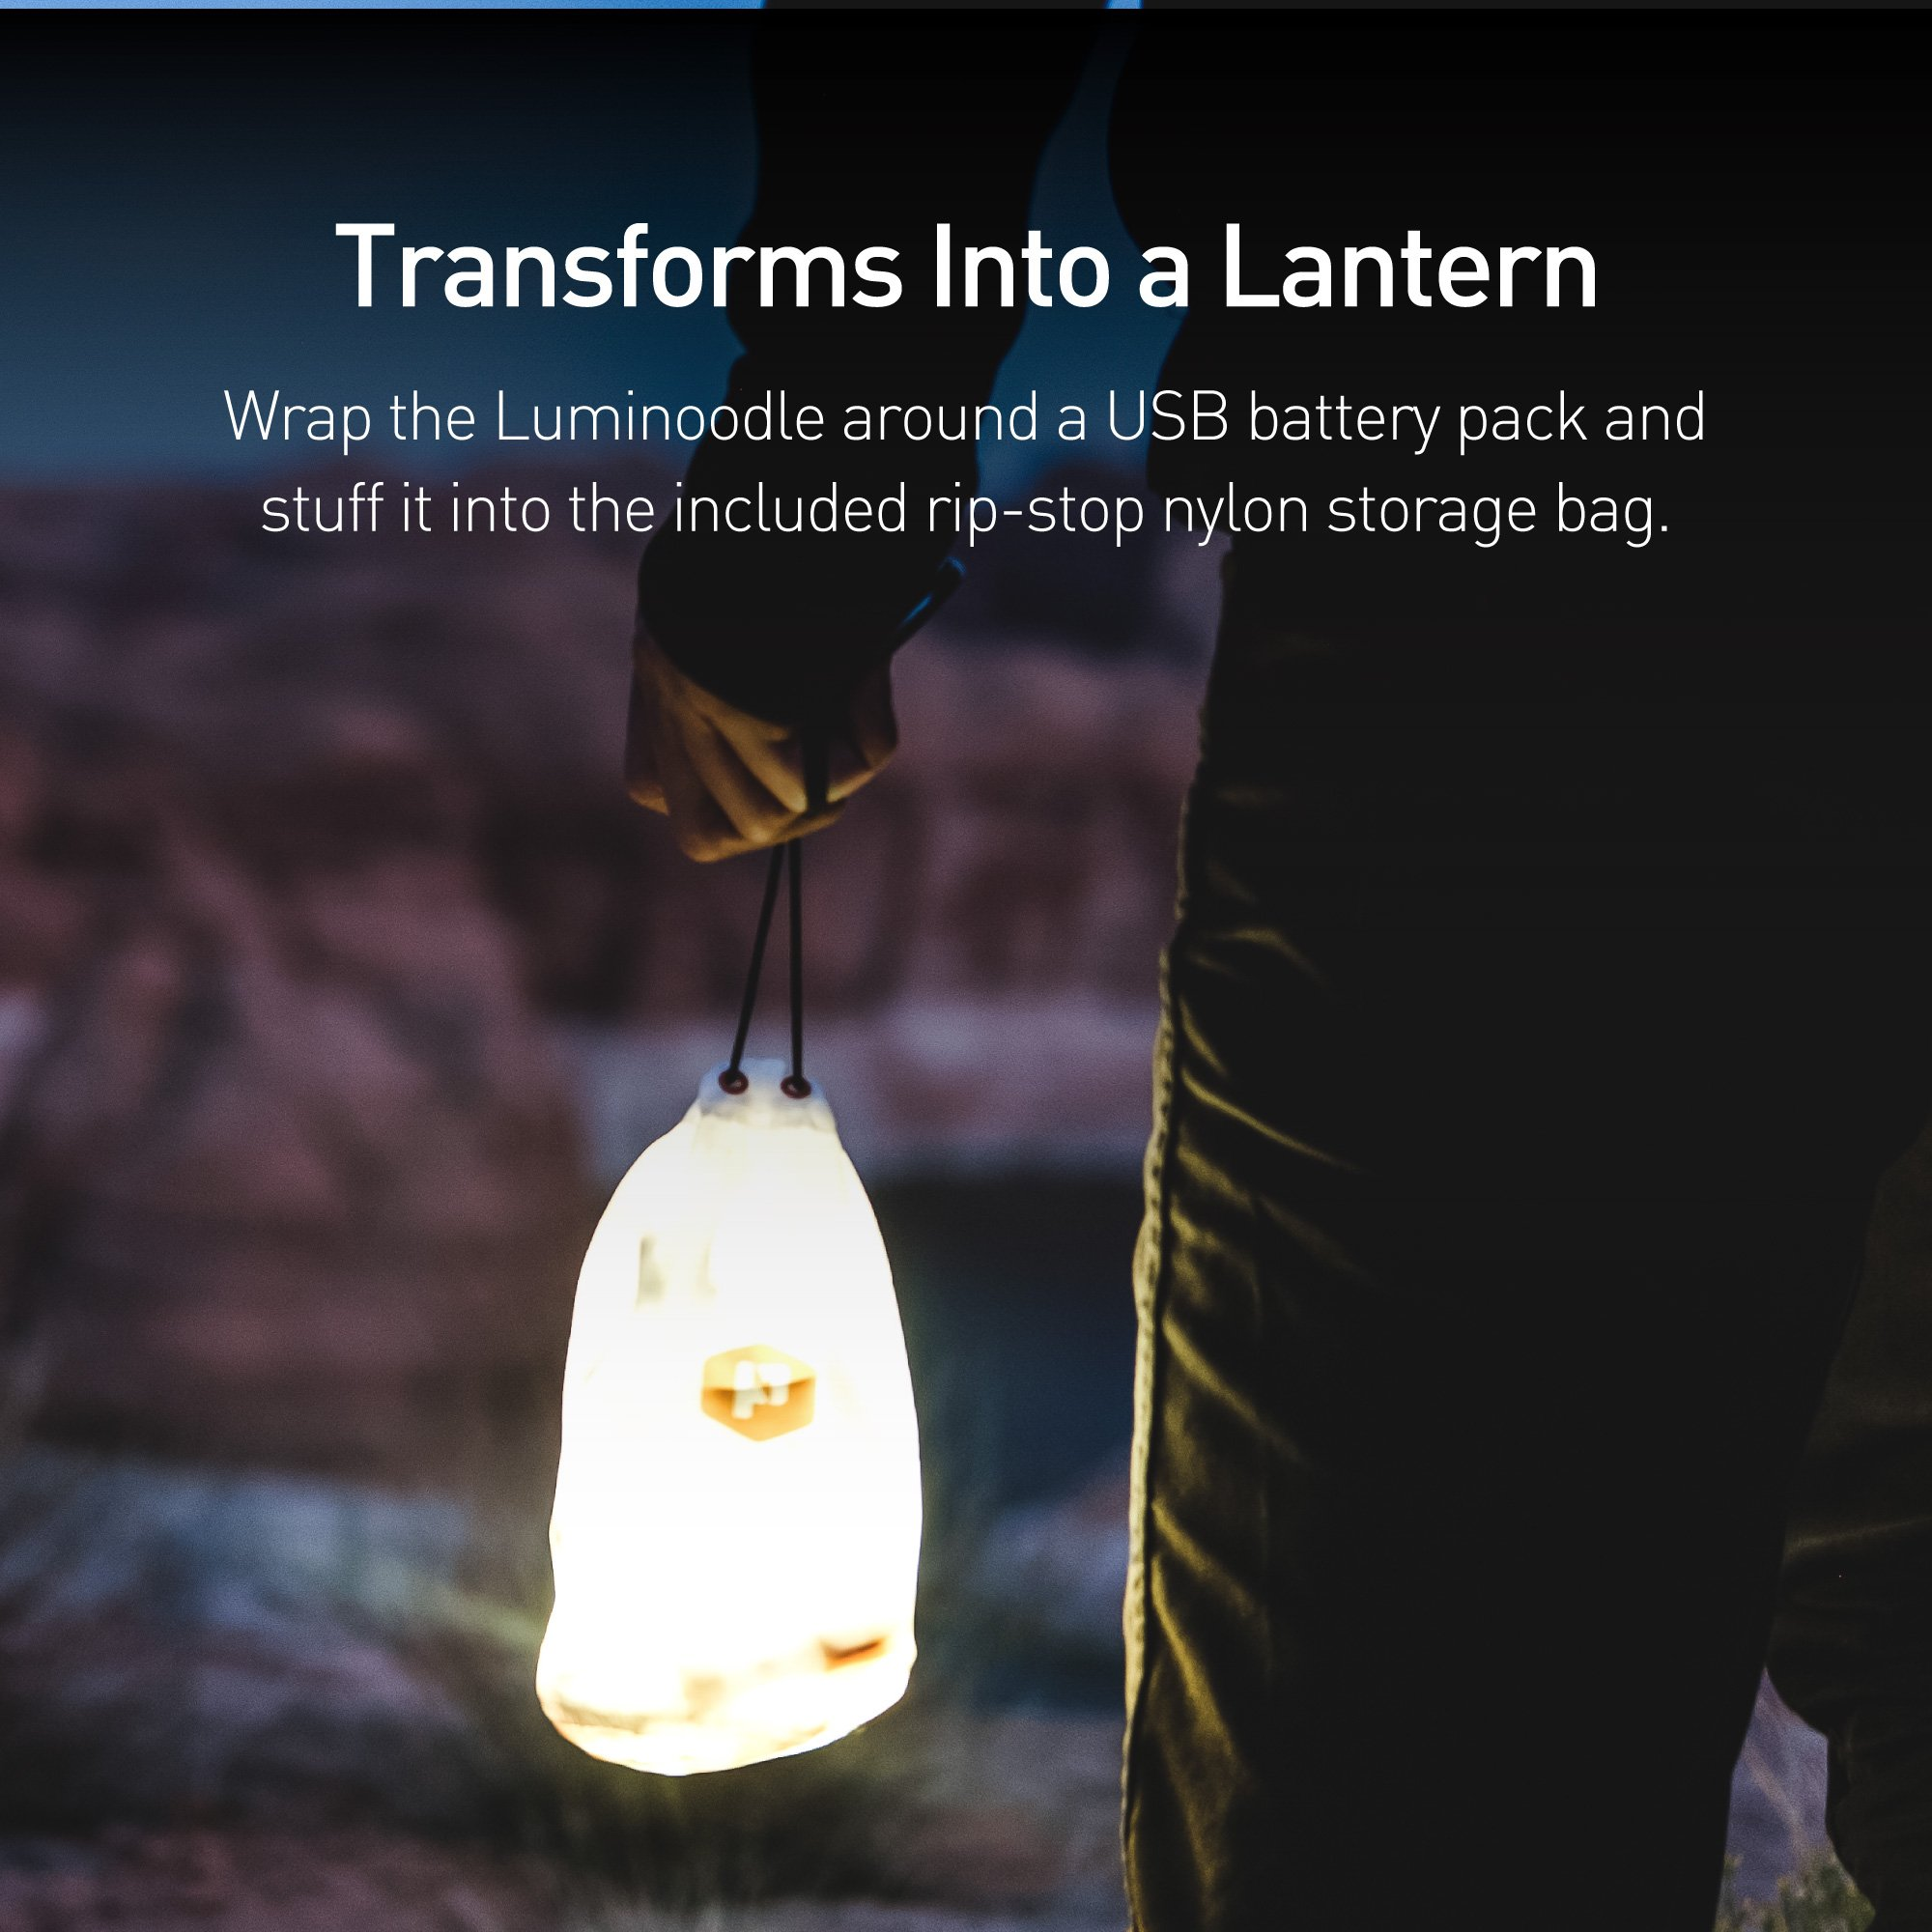 LUM-Lantern_2000x.jpg